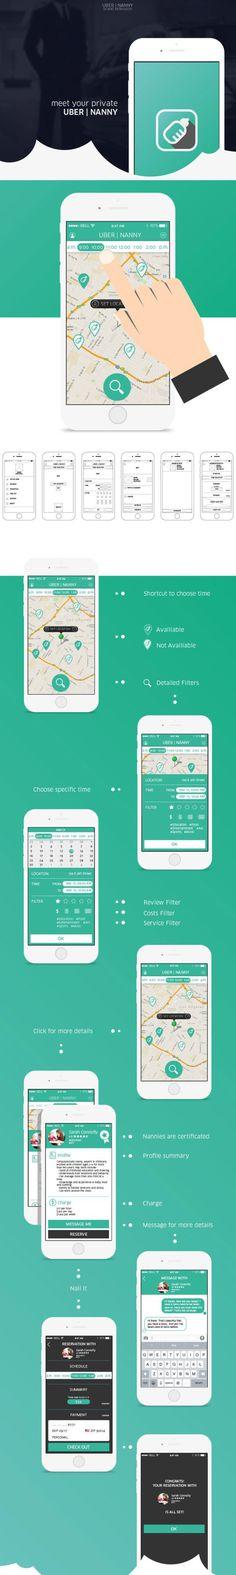 UBER|NANNY brand extension design by Qian Yu #presentation